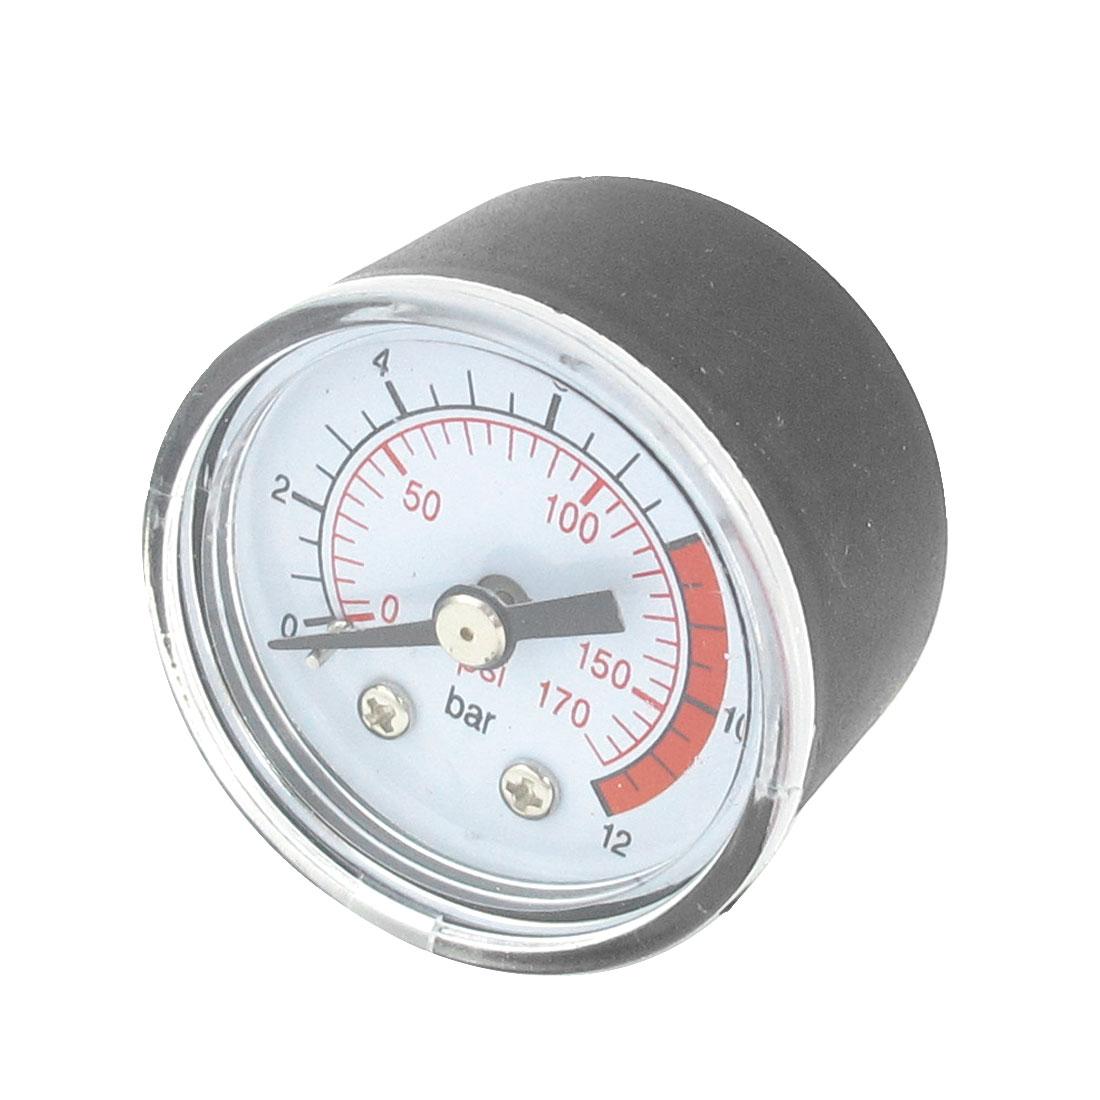 Air Compressor 1/8 PT Male Thread 0-170PSI Pressure Gauge Black